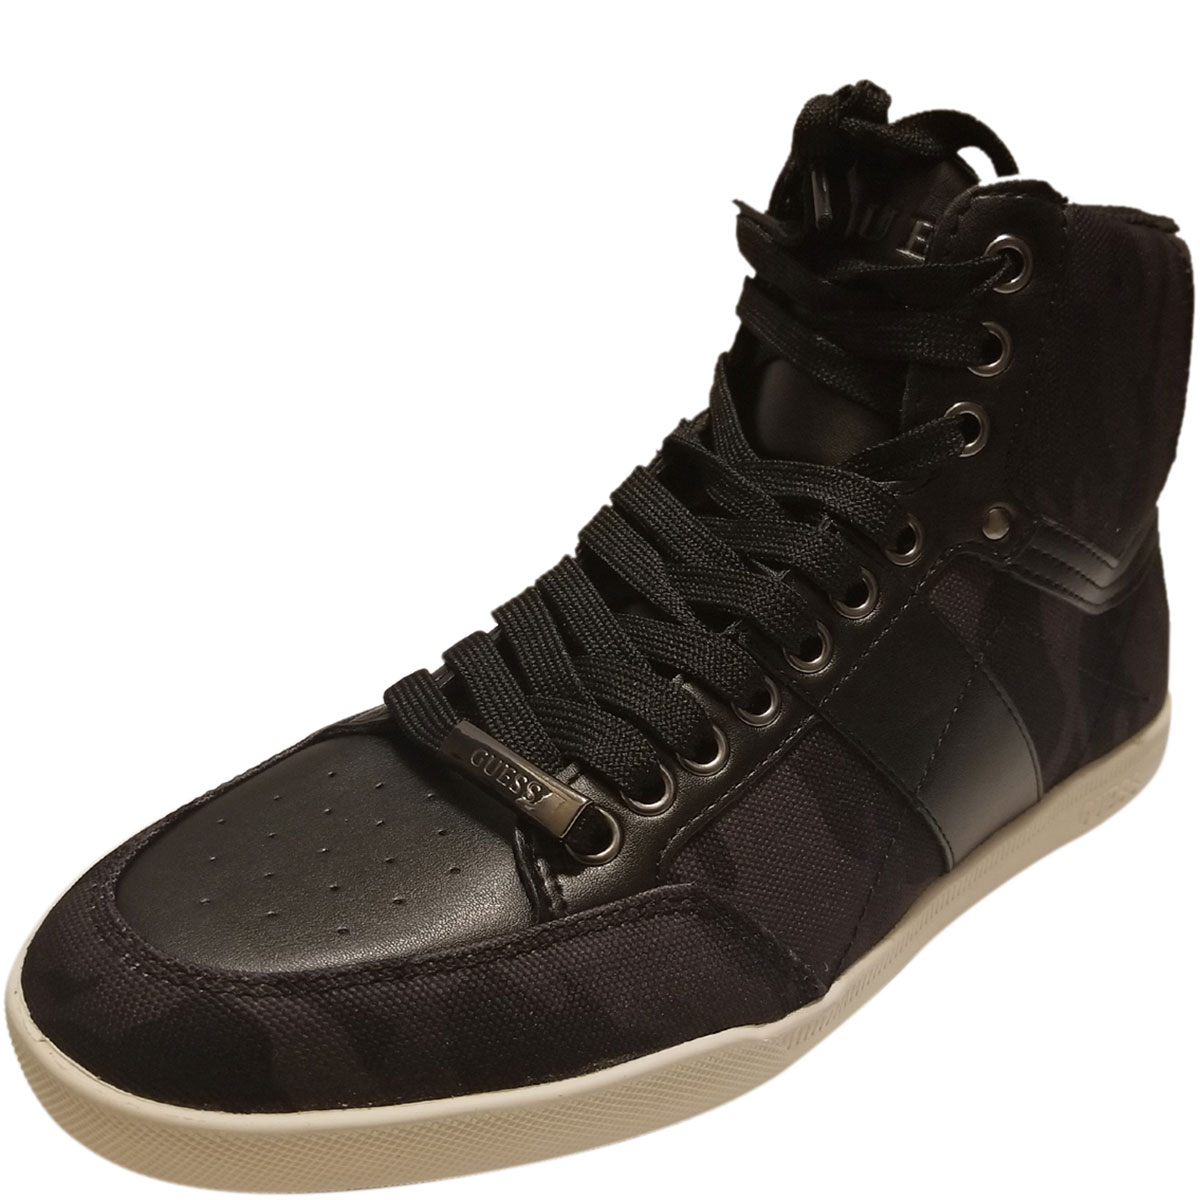 Guess Men's High-top Fomo Sneakers